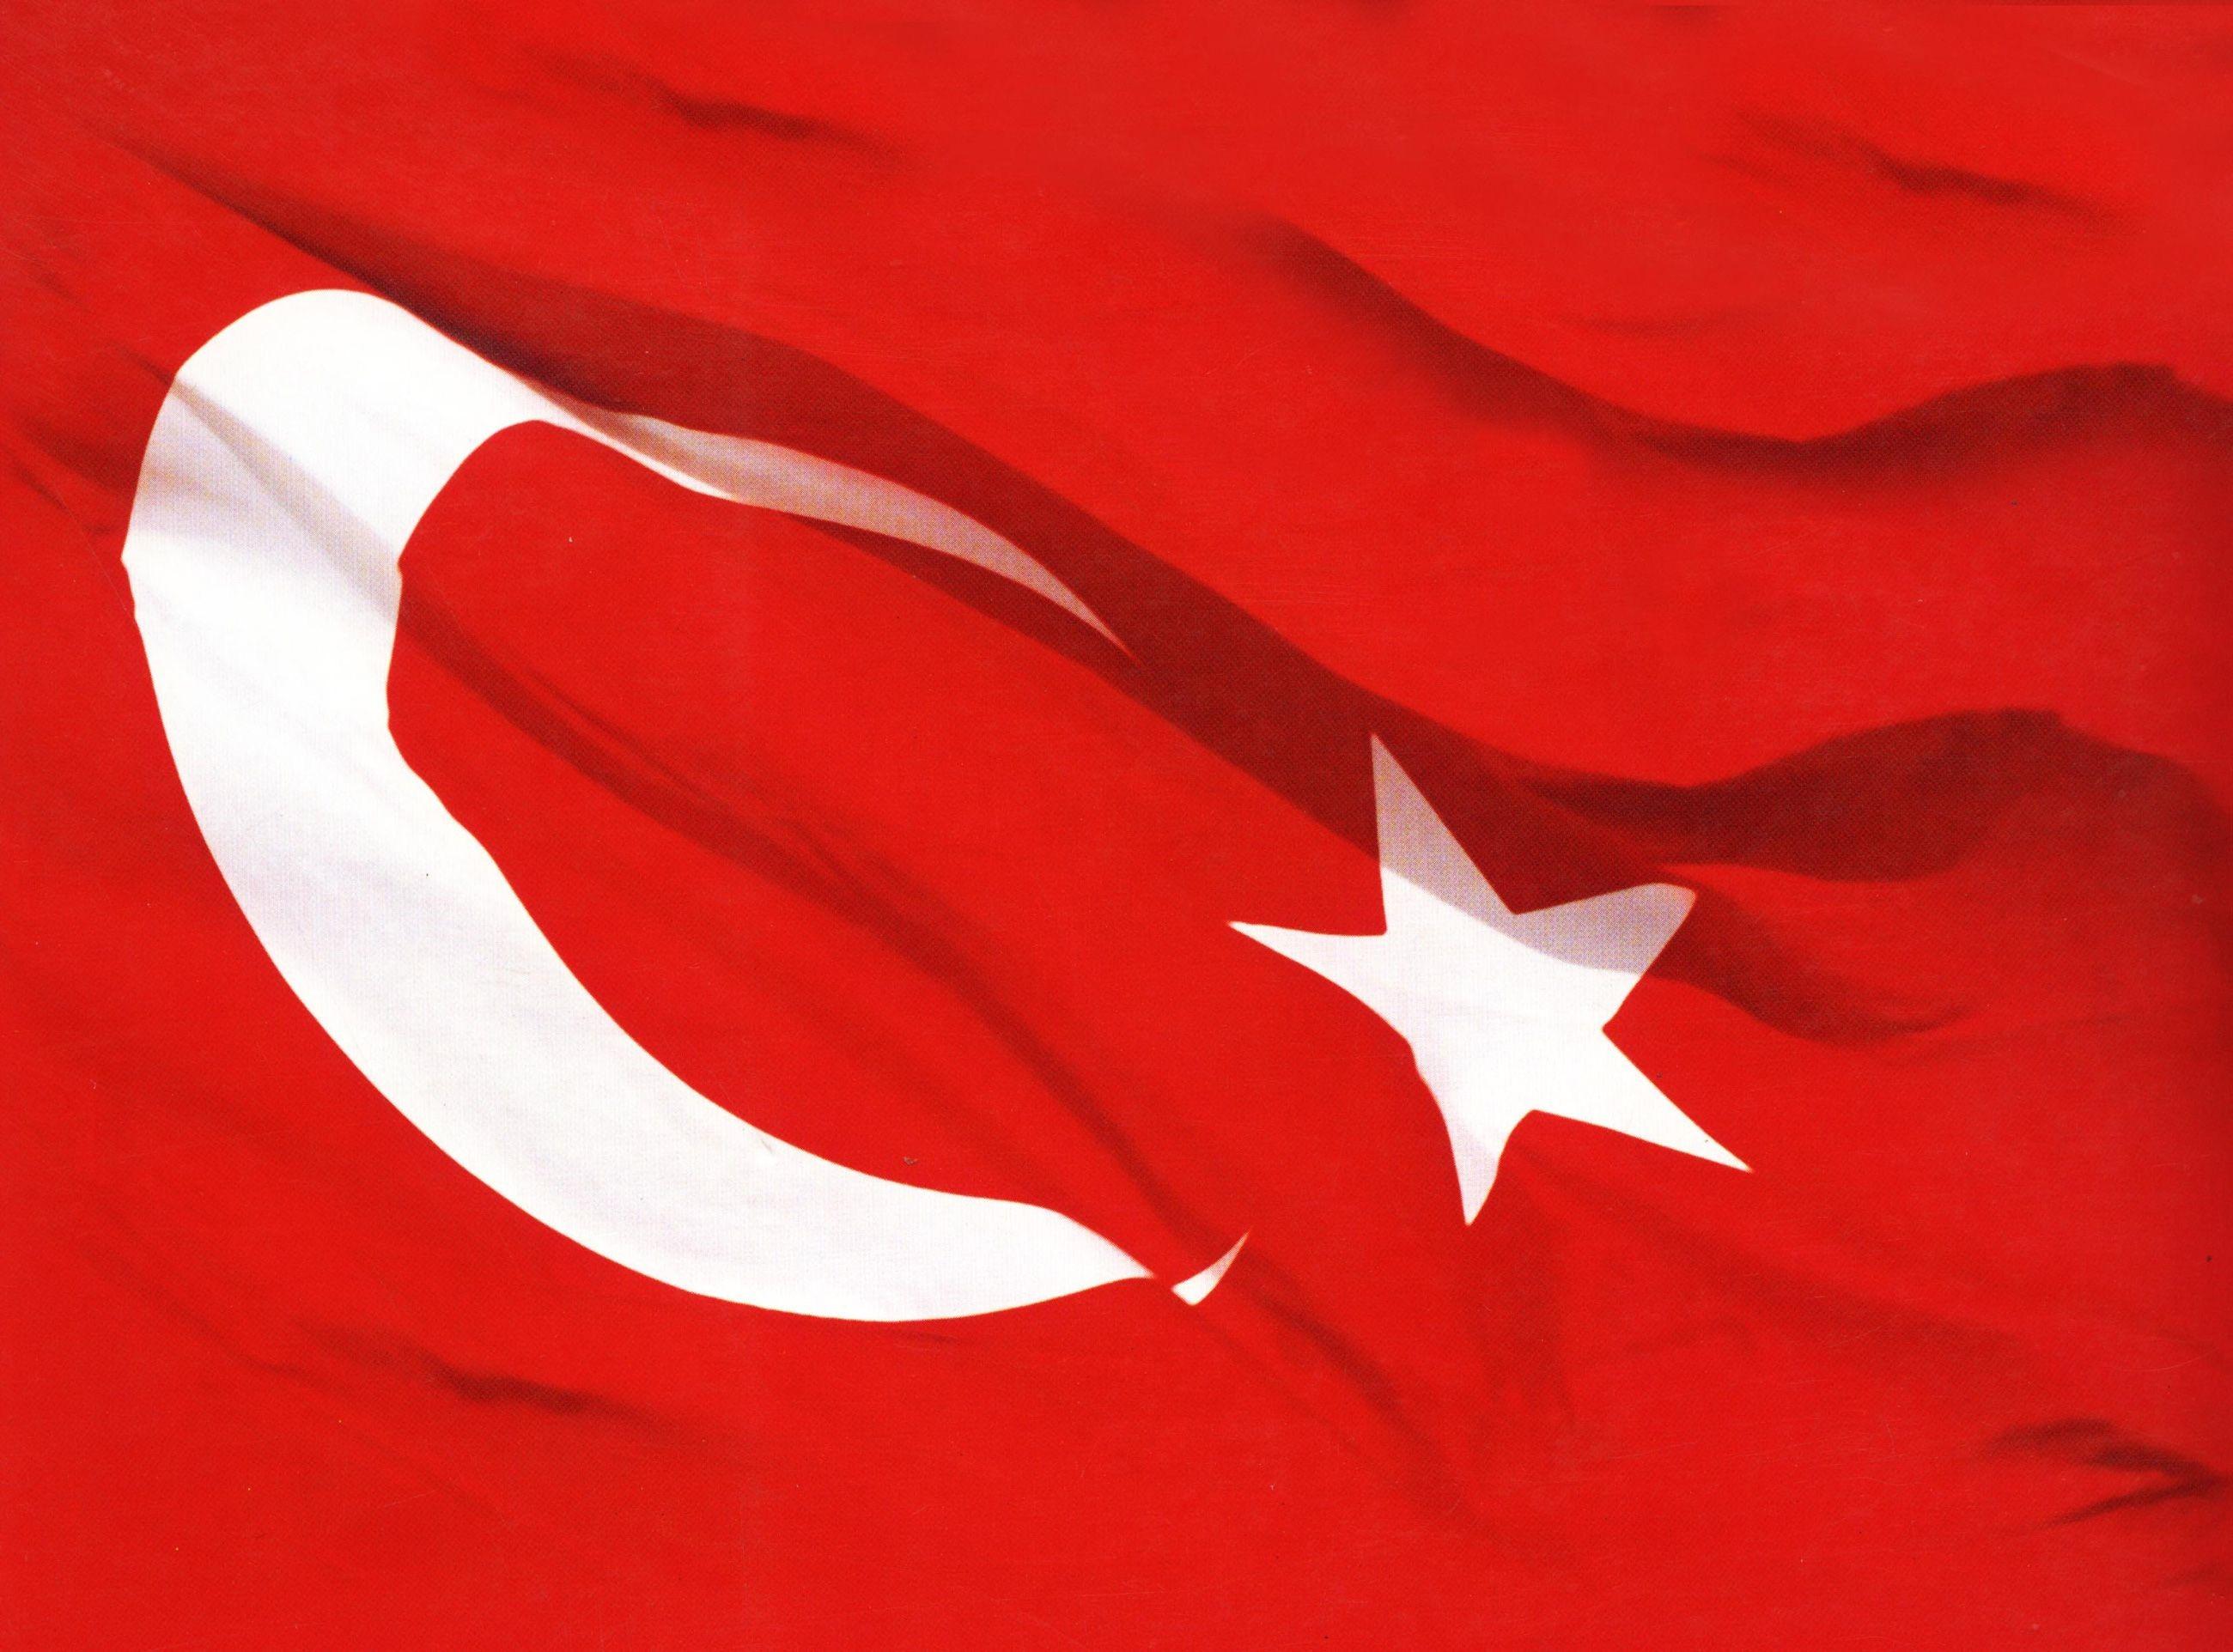 Türk Bayrağı 1080p wallpapers